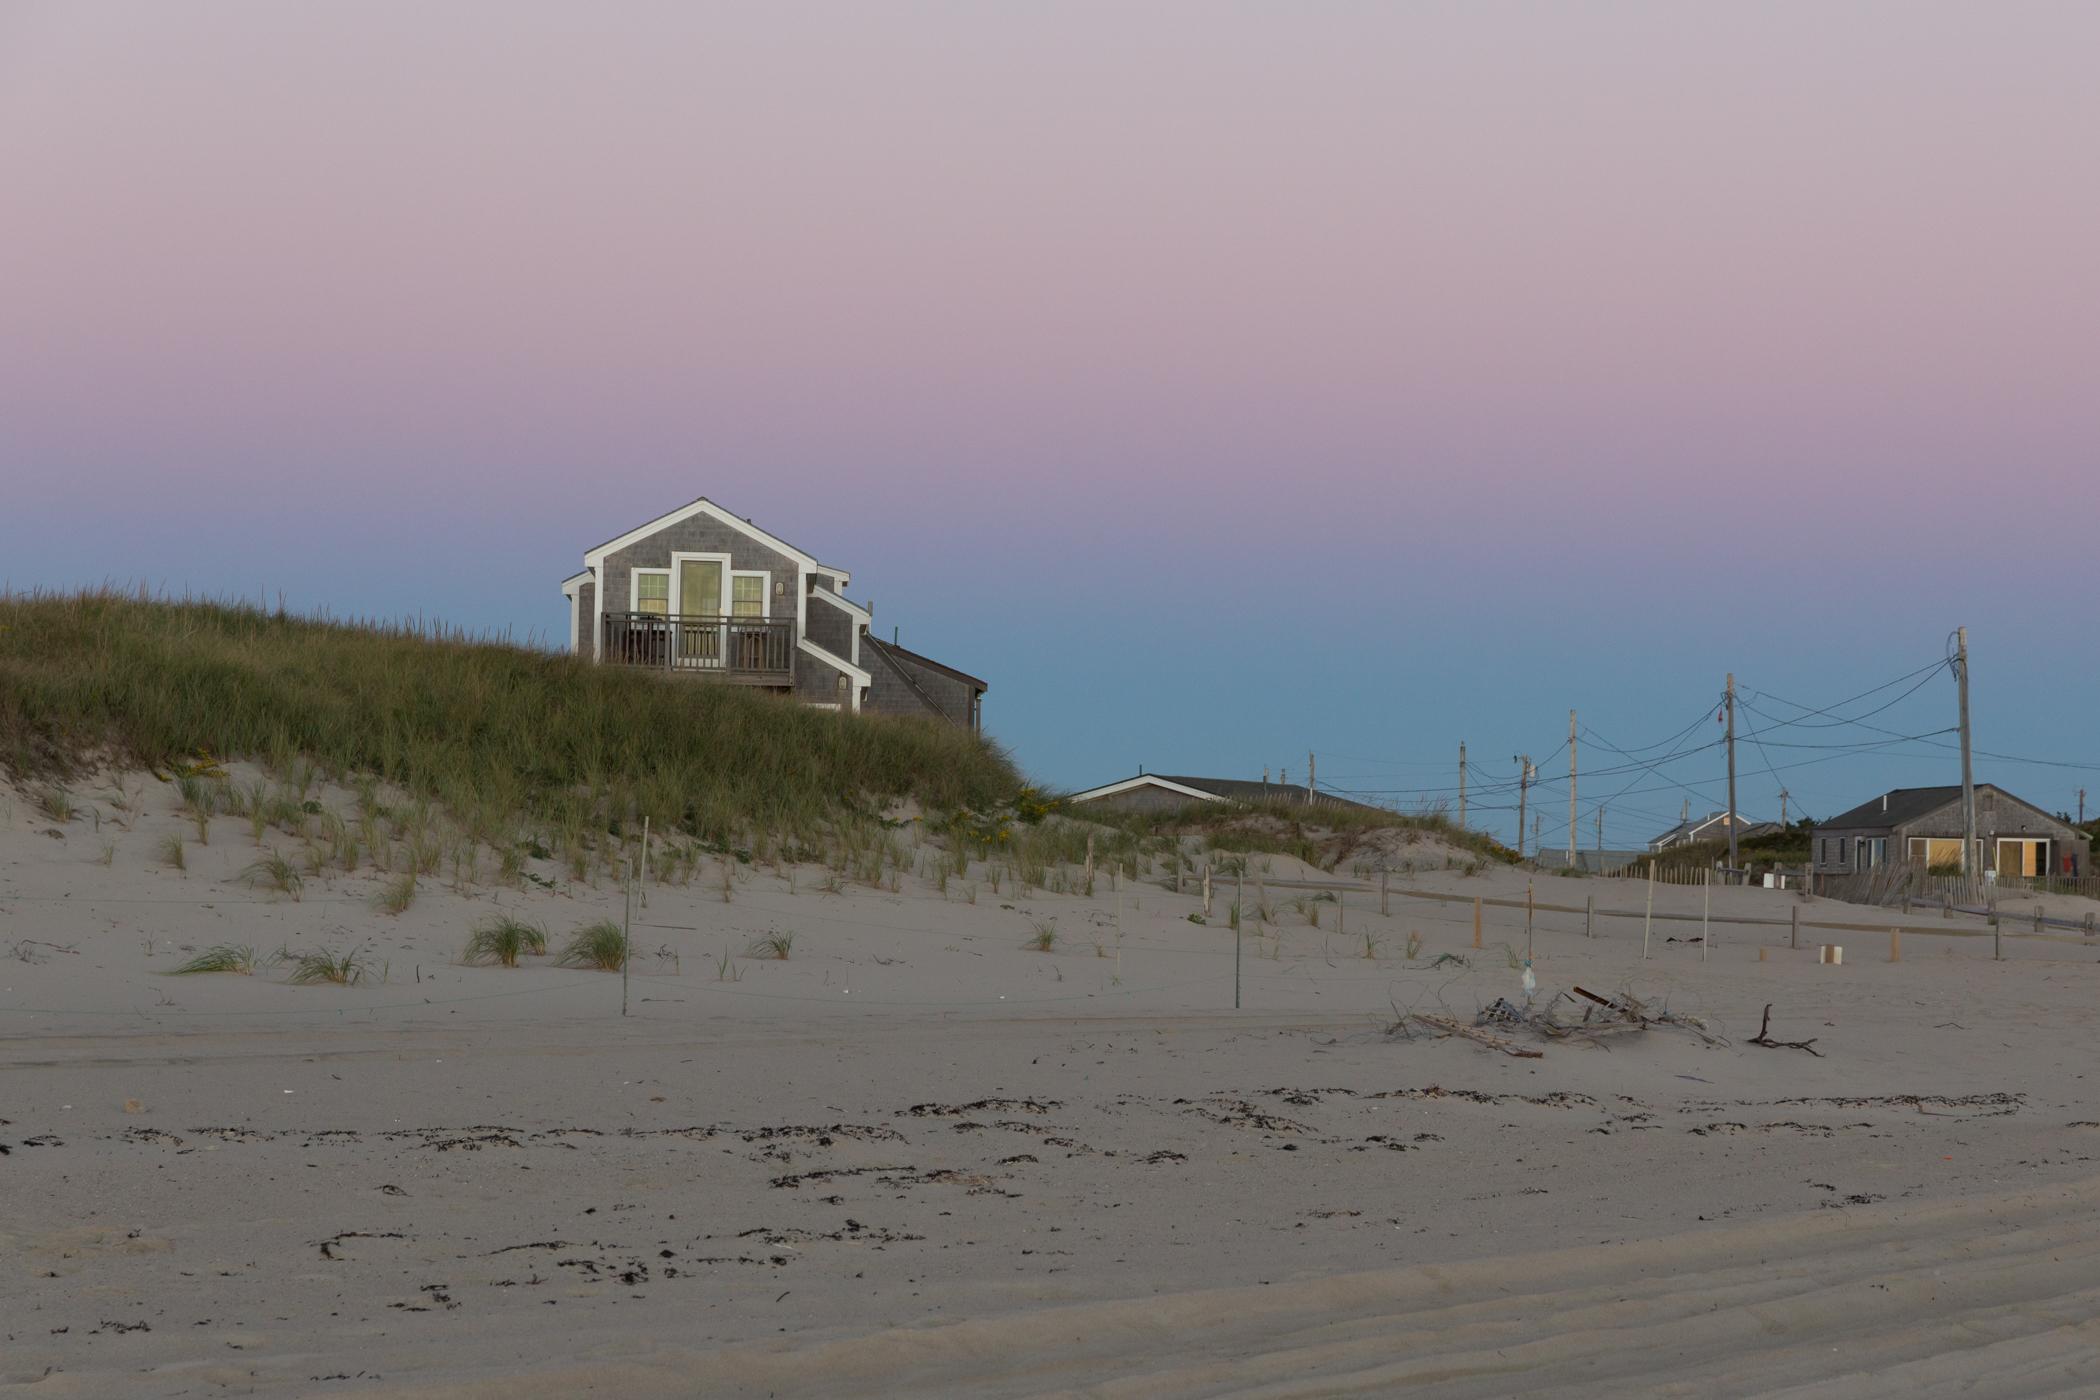 1610-Nantucket-362.jpg